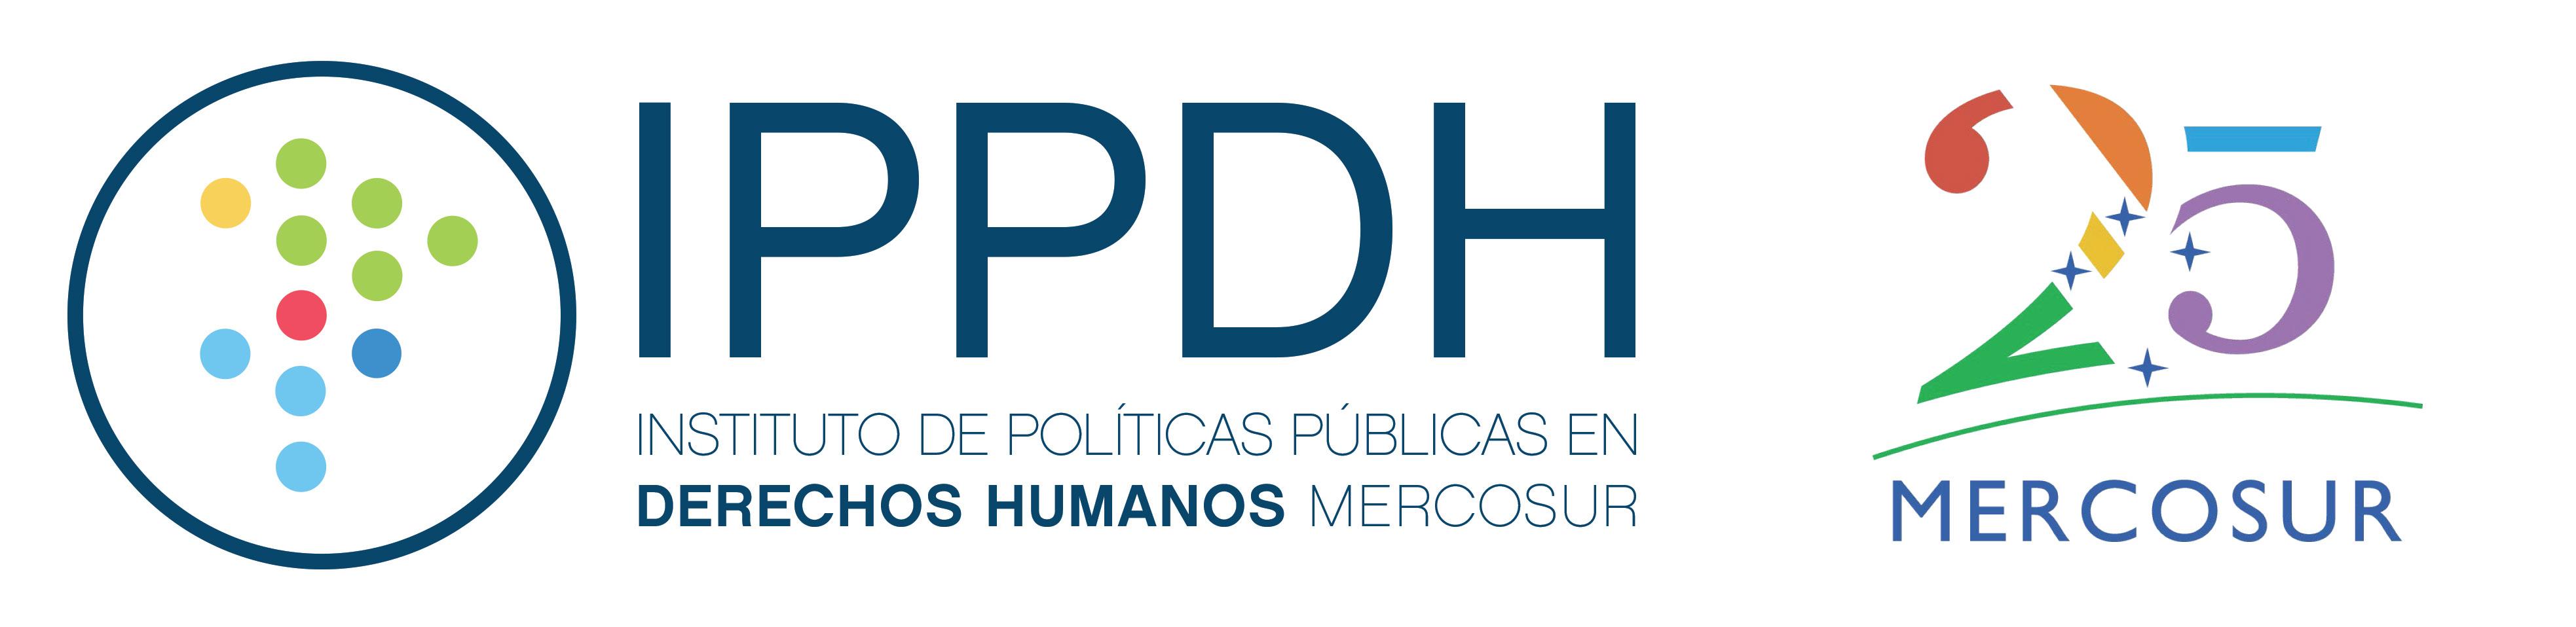 LogoIPPDH-25anhos